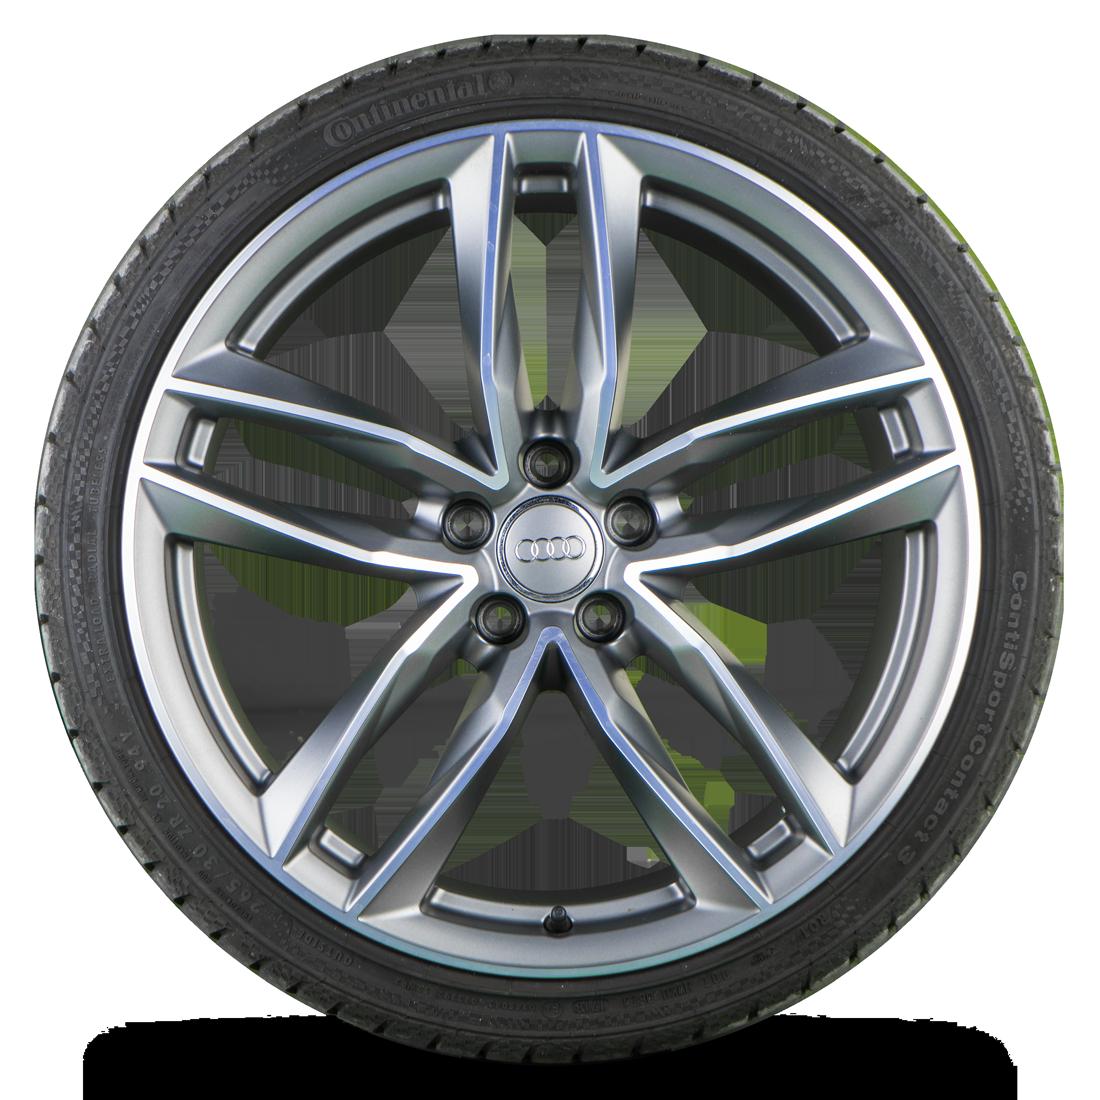 Original Audi 20 Zoll Felgen A5 S5 B8 Alufelgen Sommerreifen Sommerräder